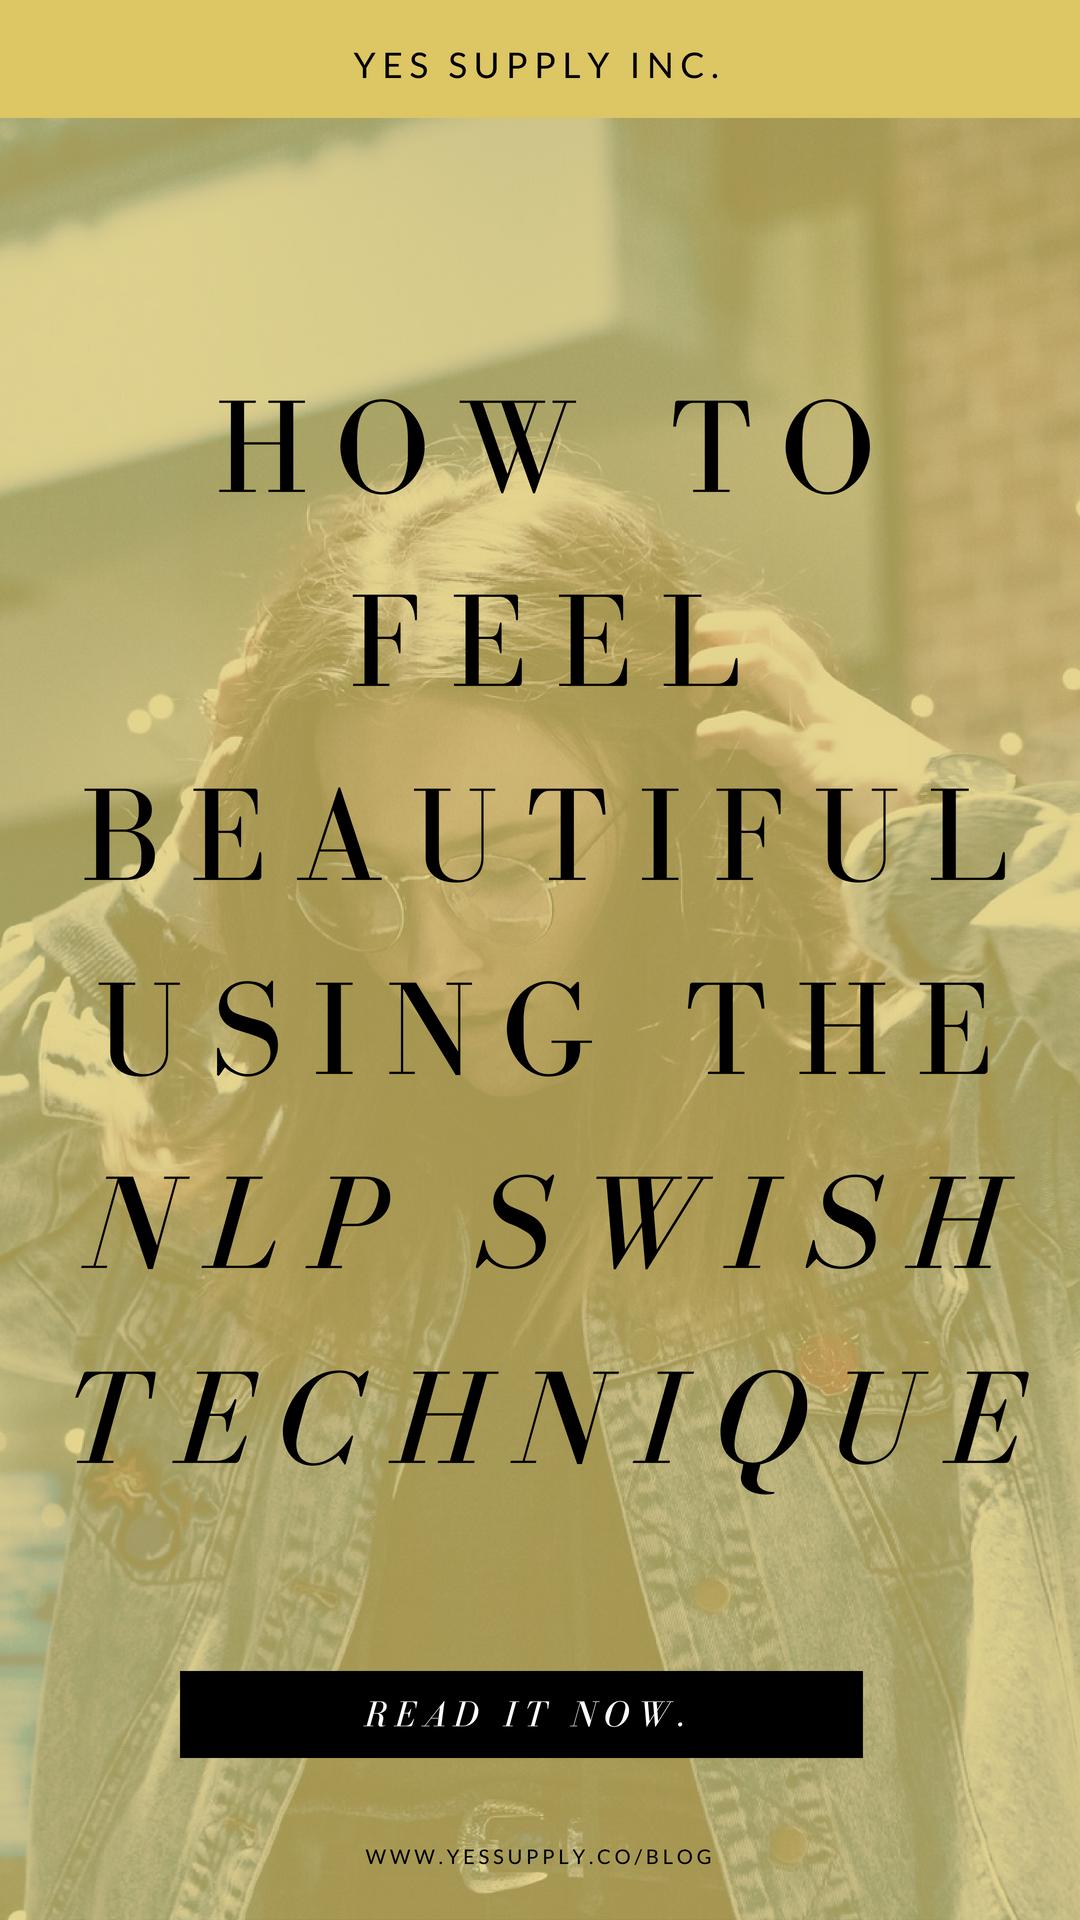 NLP Swish technique